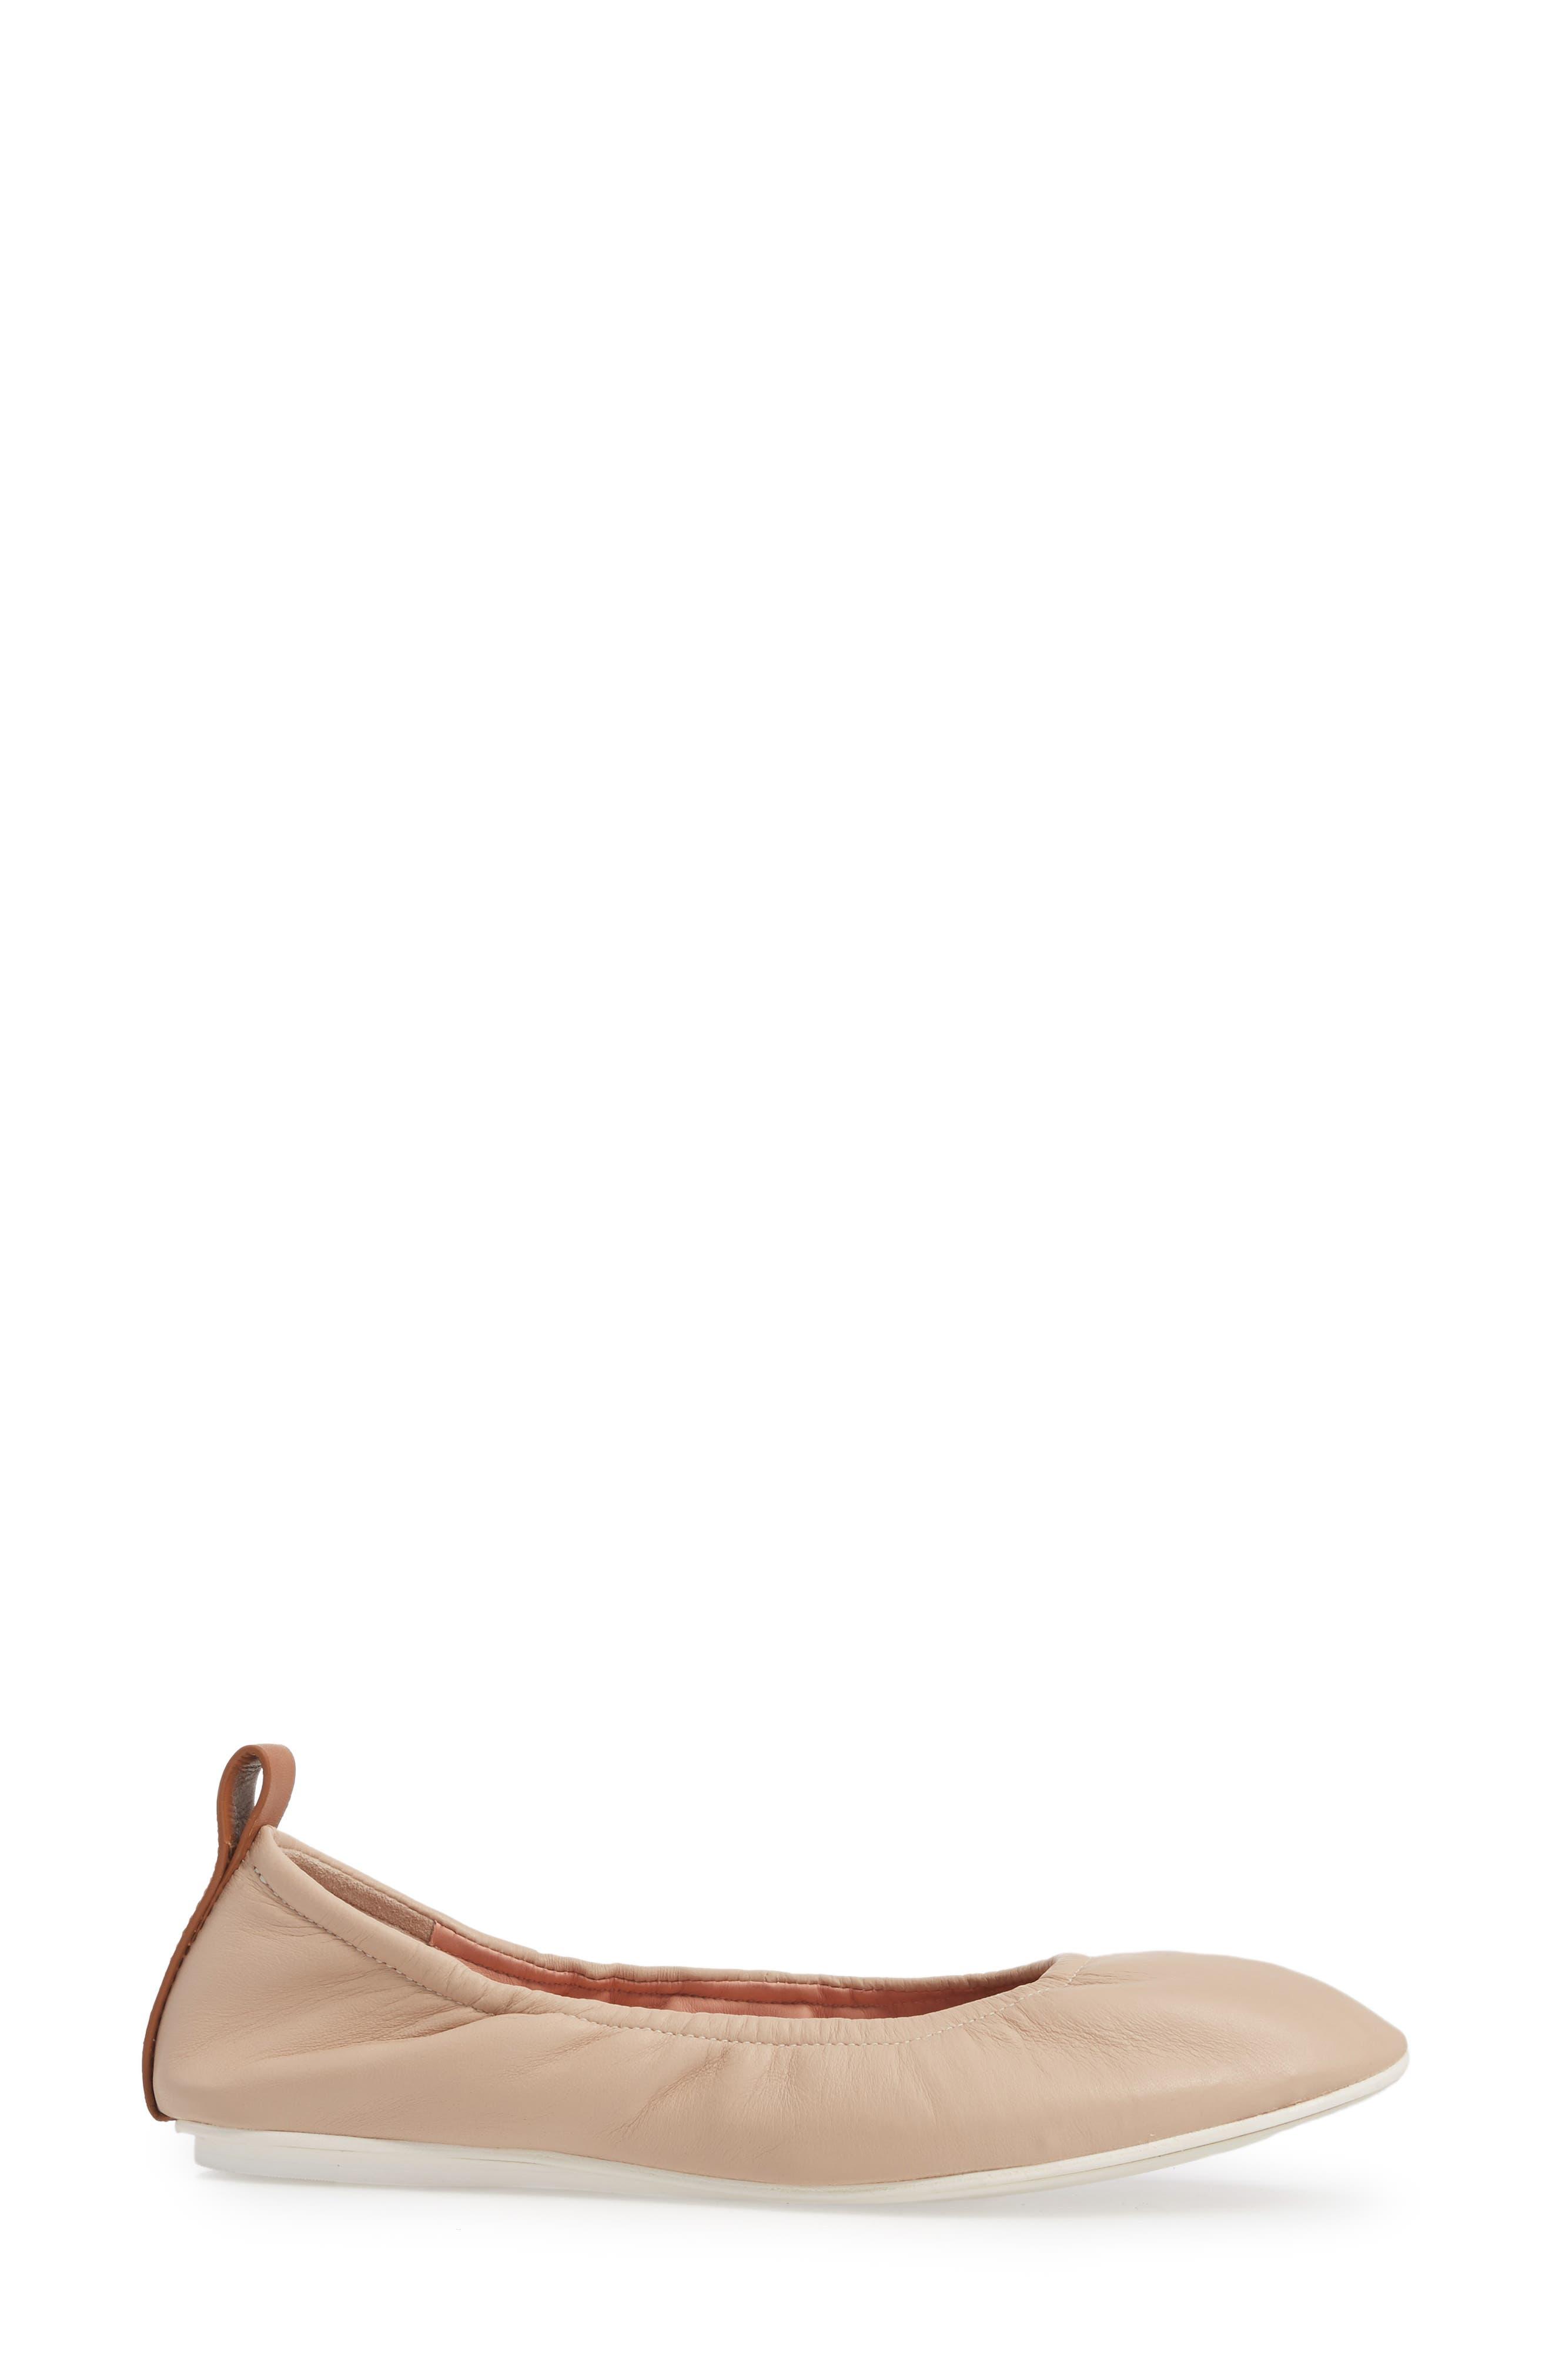 Carola Ballet Flat,                             Alternate thumbnail 40, color,